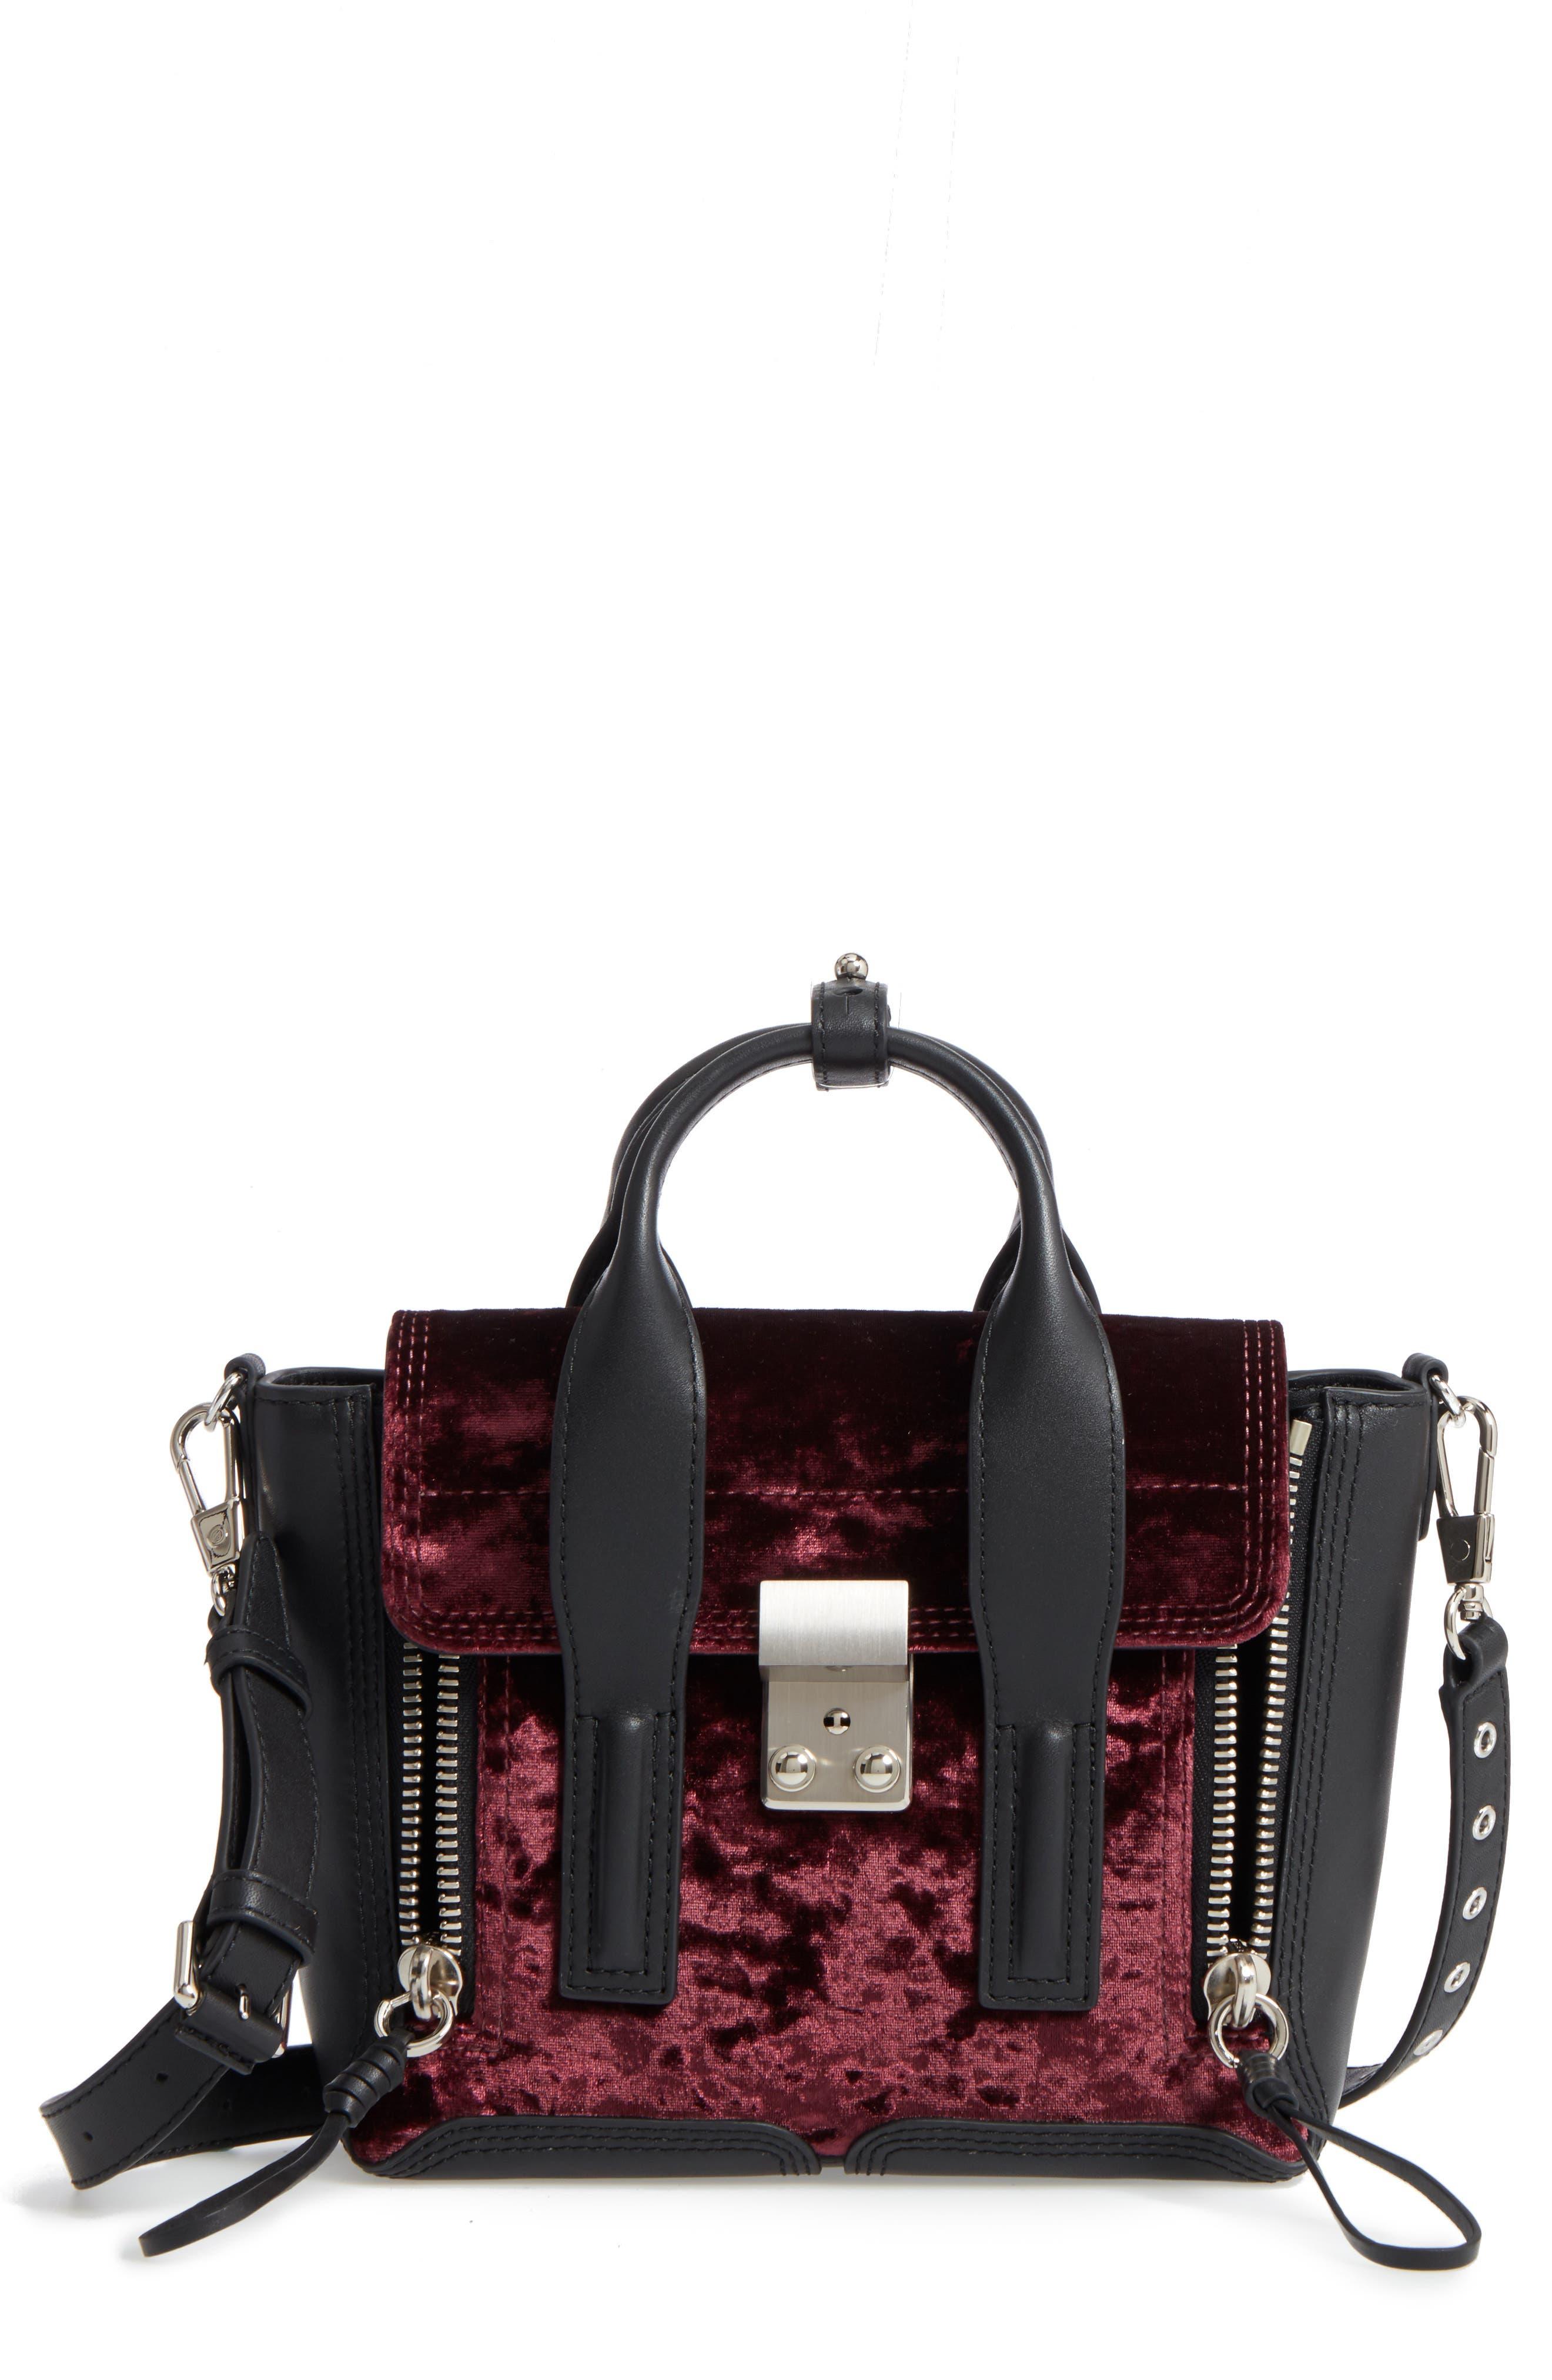 3.1 Phillip Lim Mini Pashli Velvet & Leather Satchel